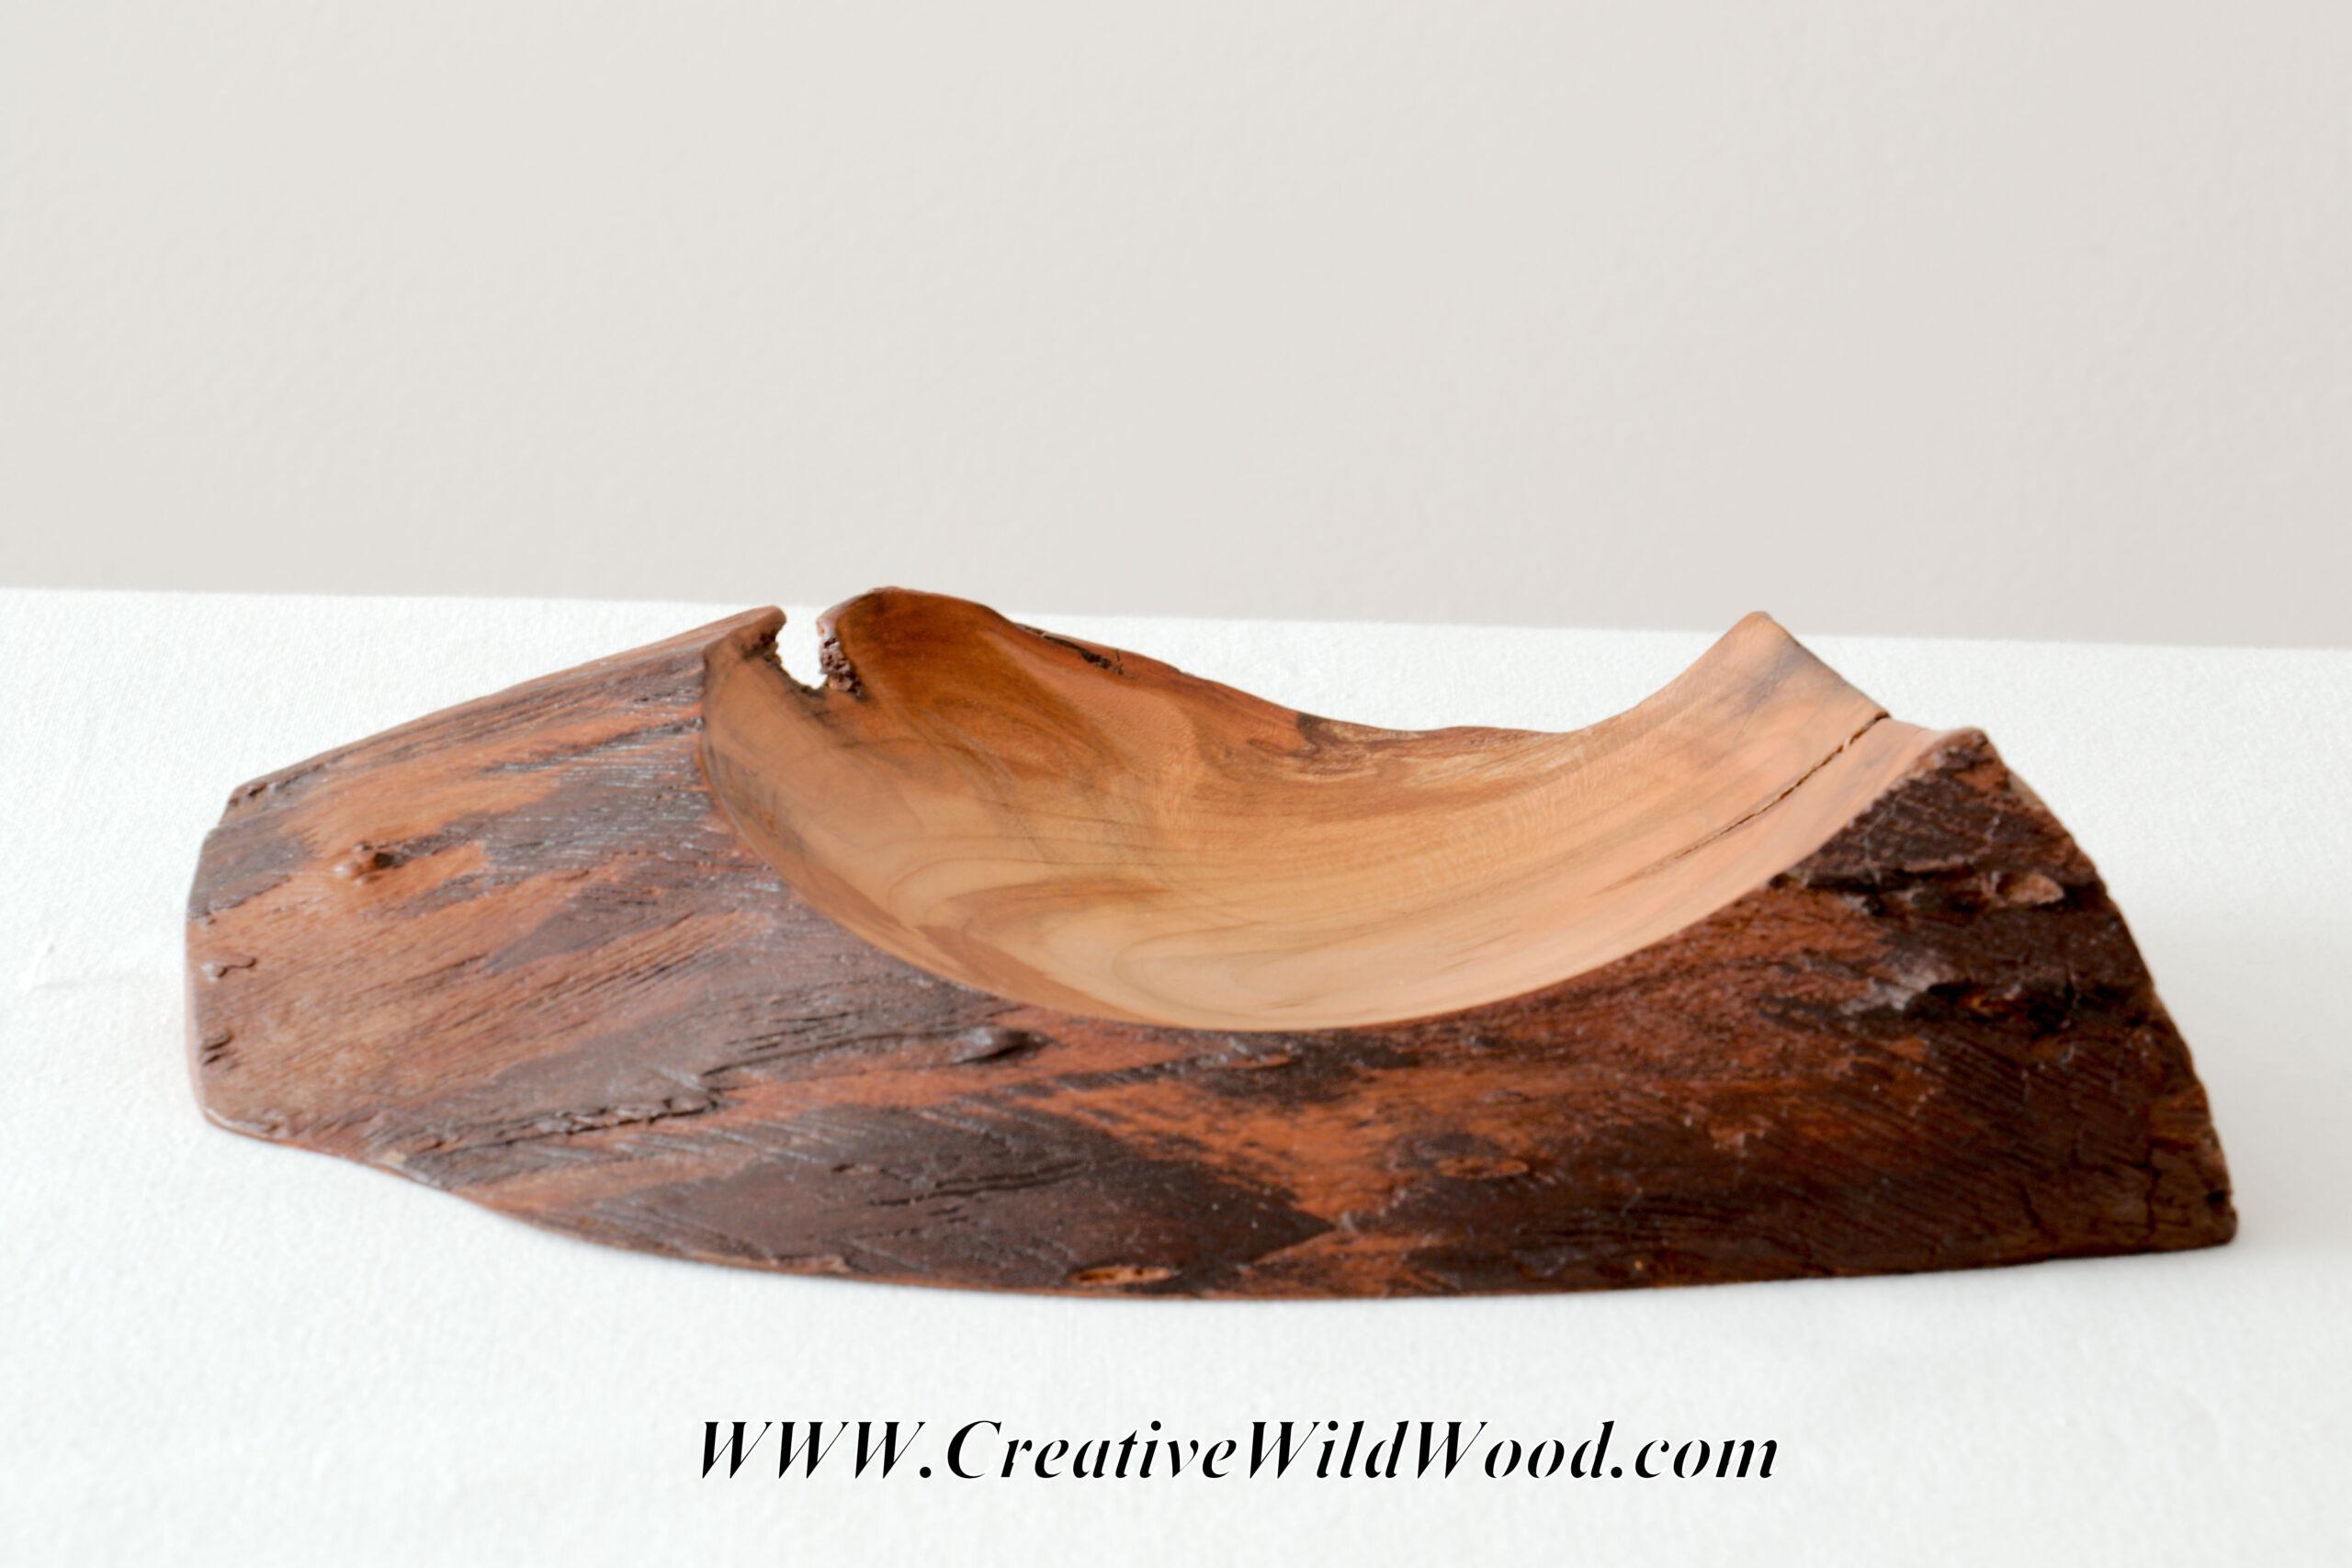 Natural Edge Cherry Wood Bowl